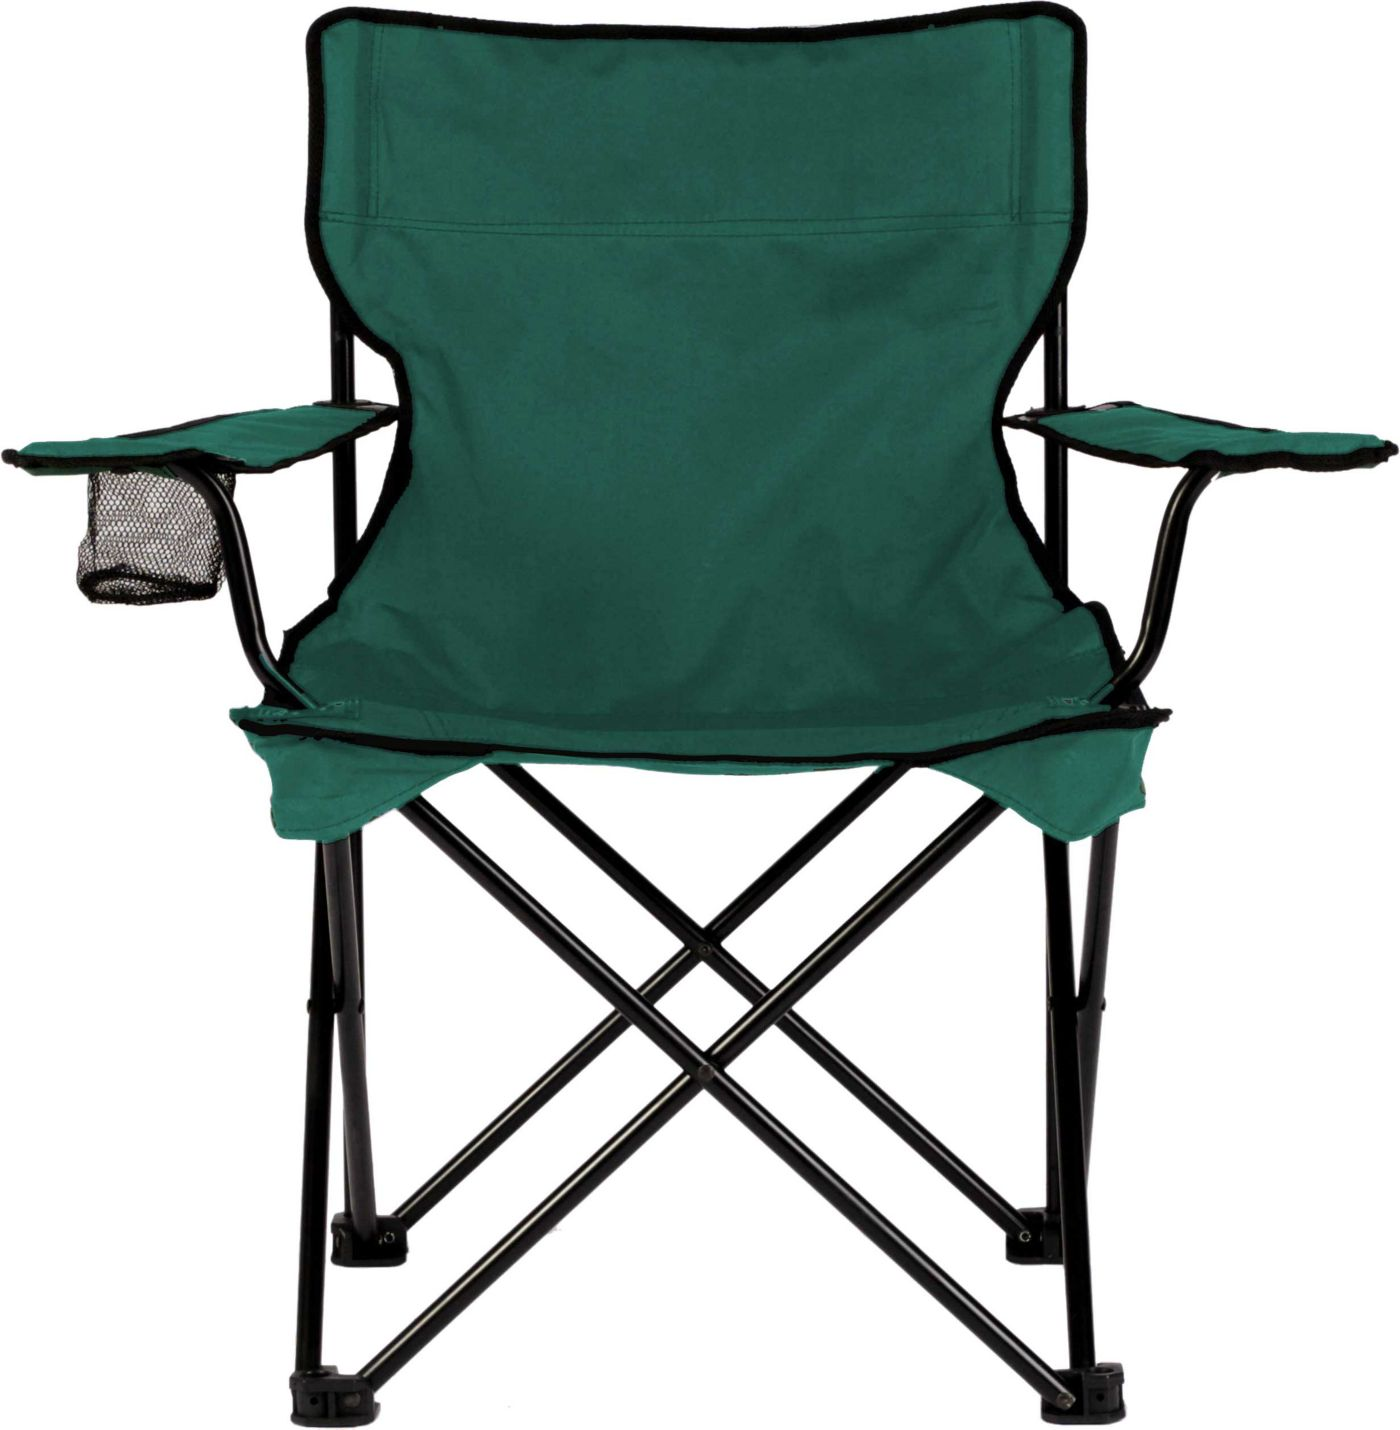 TravelChair C-Series Rider Chair